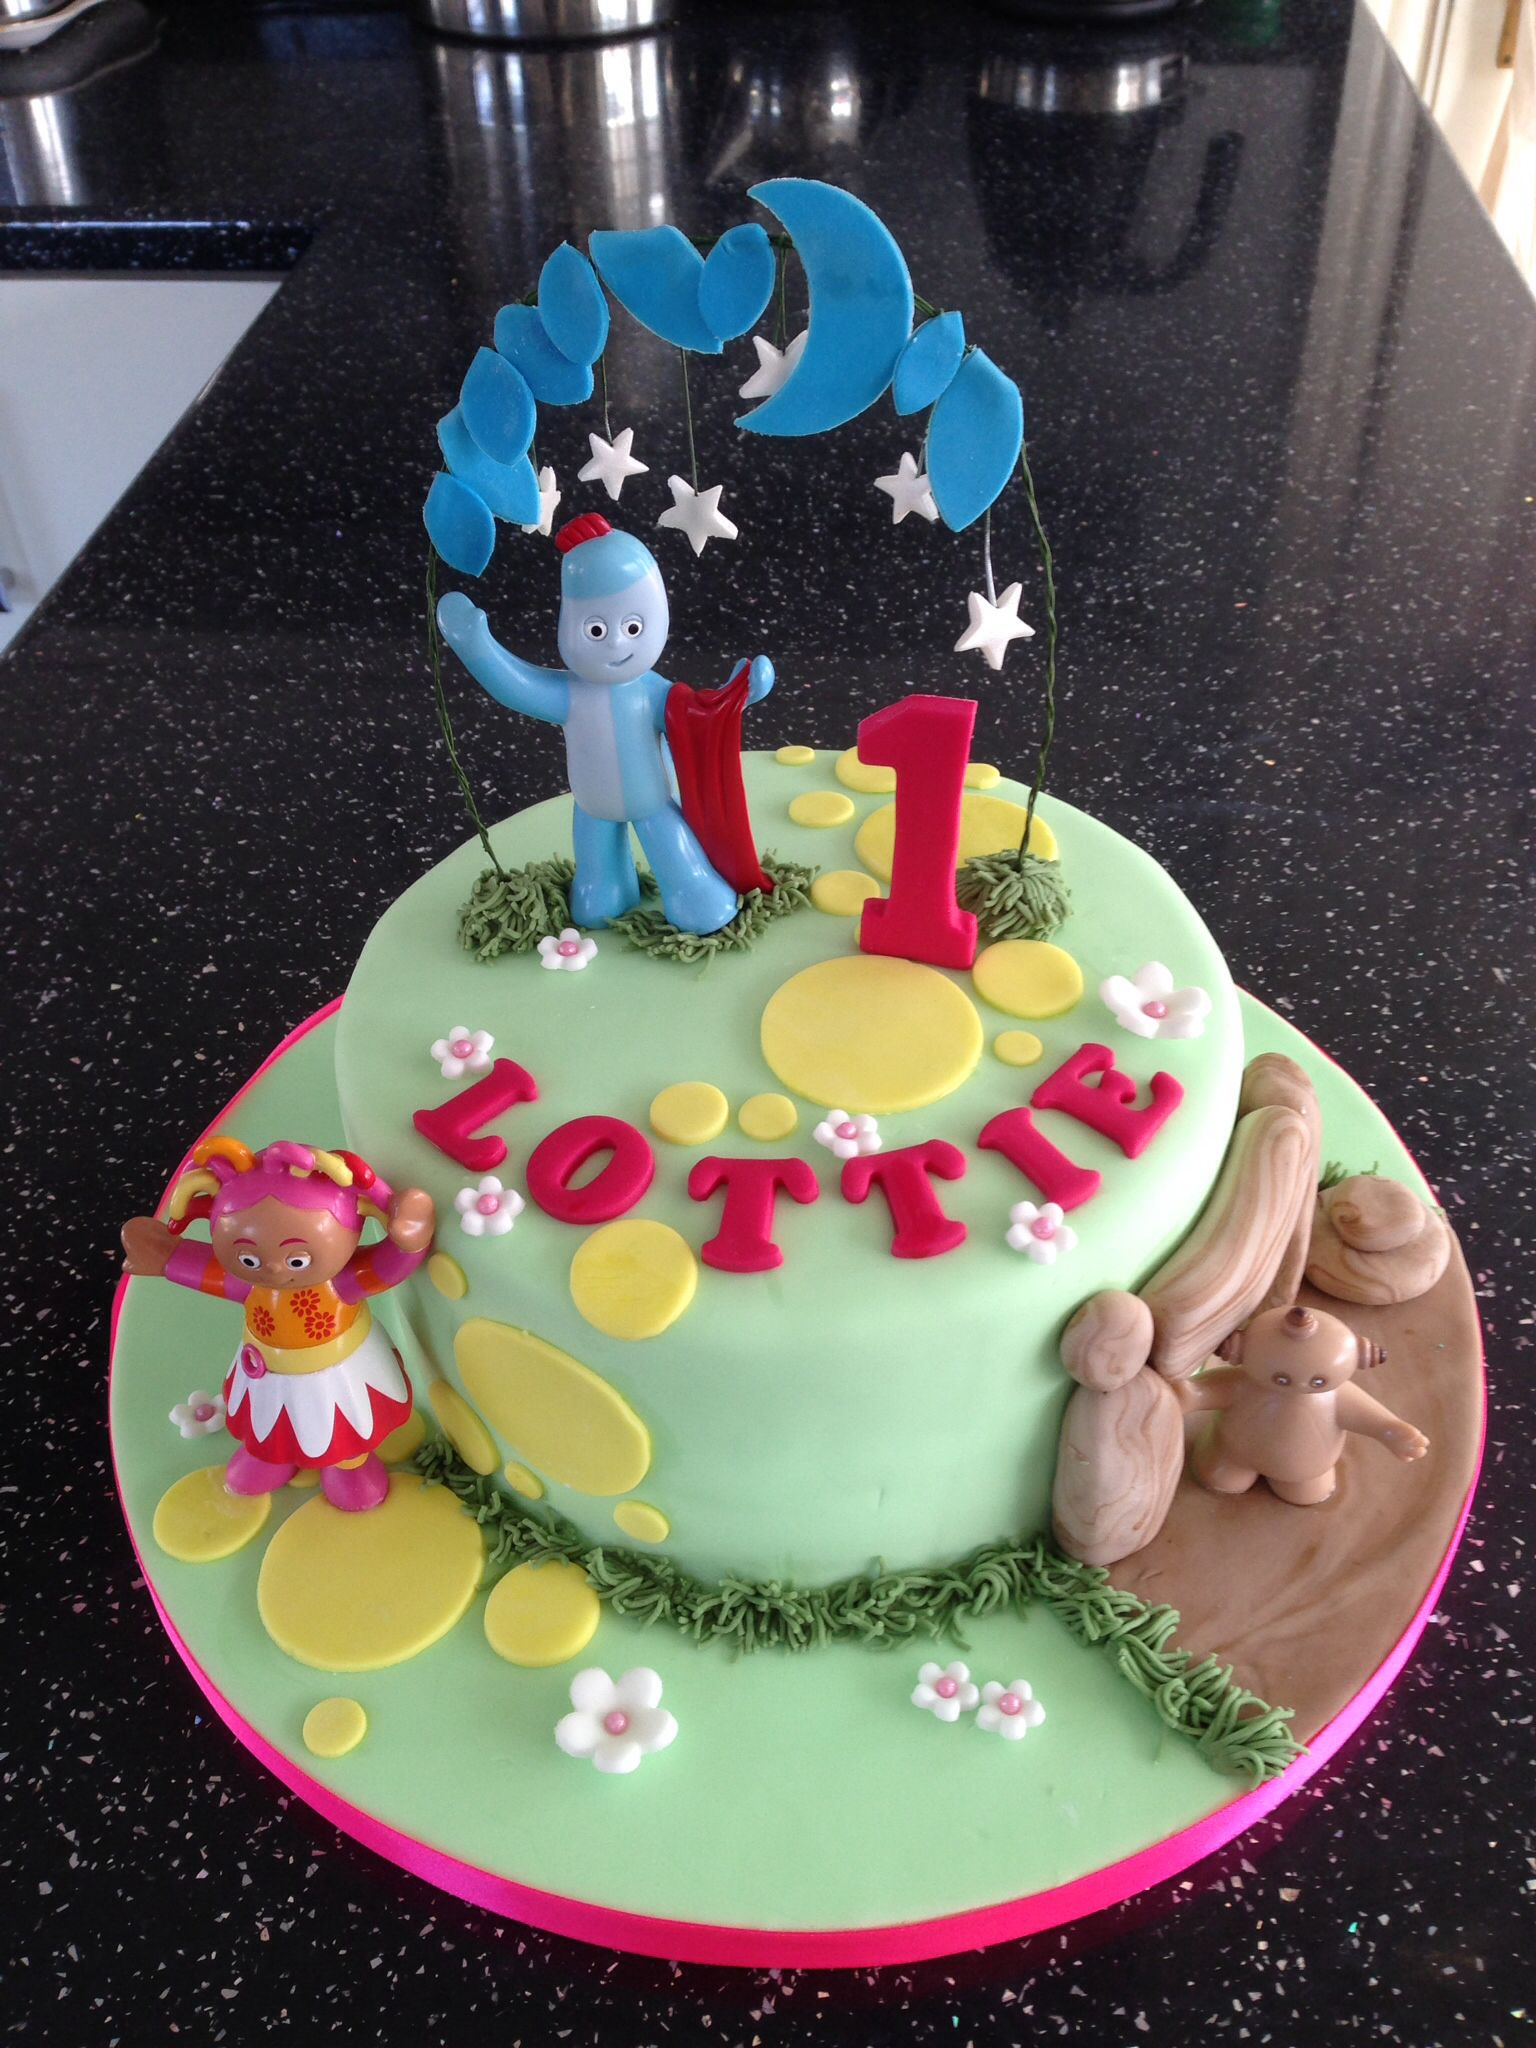 In the Night Garden cake. Iggle Piggle 1st Birthday Cake | Neva Cake ...